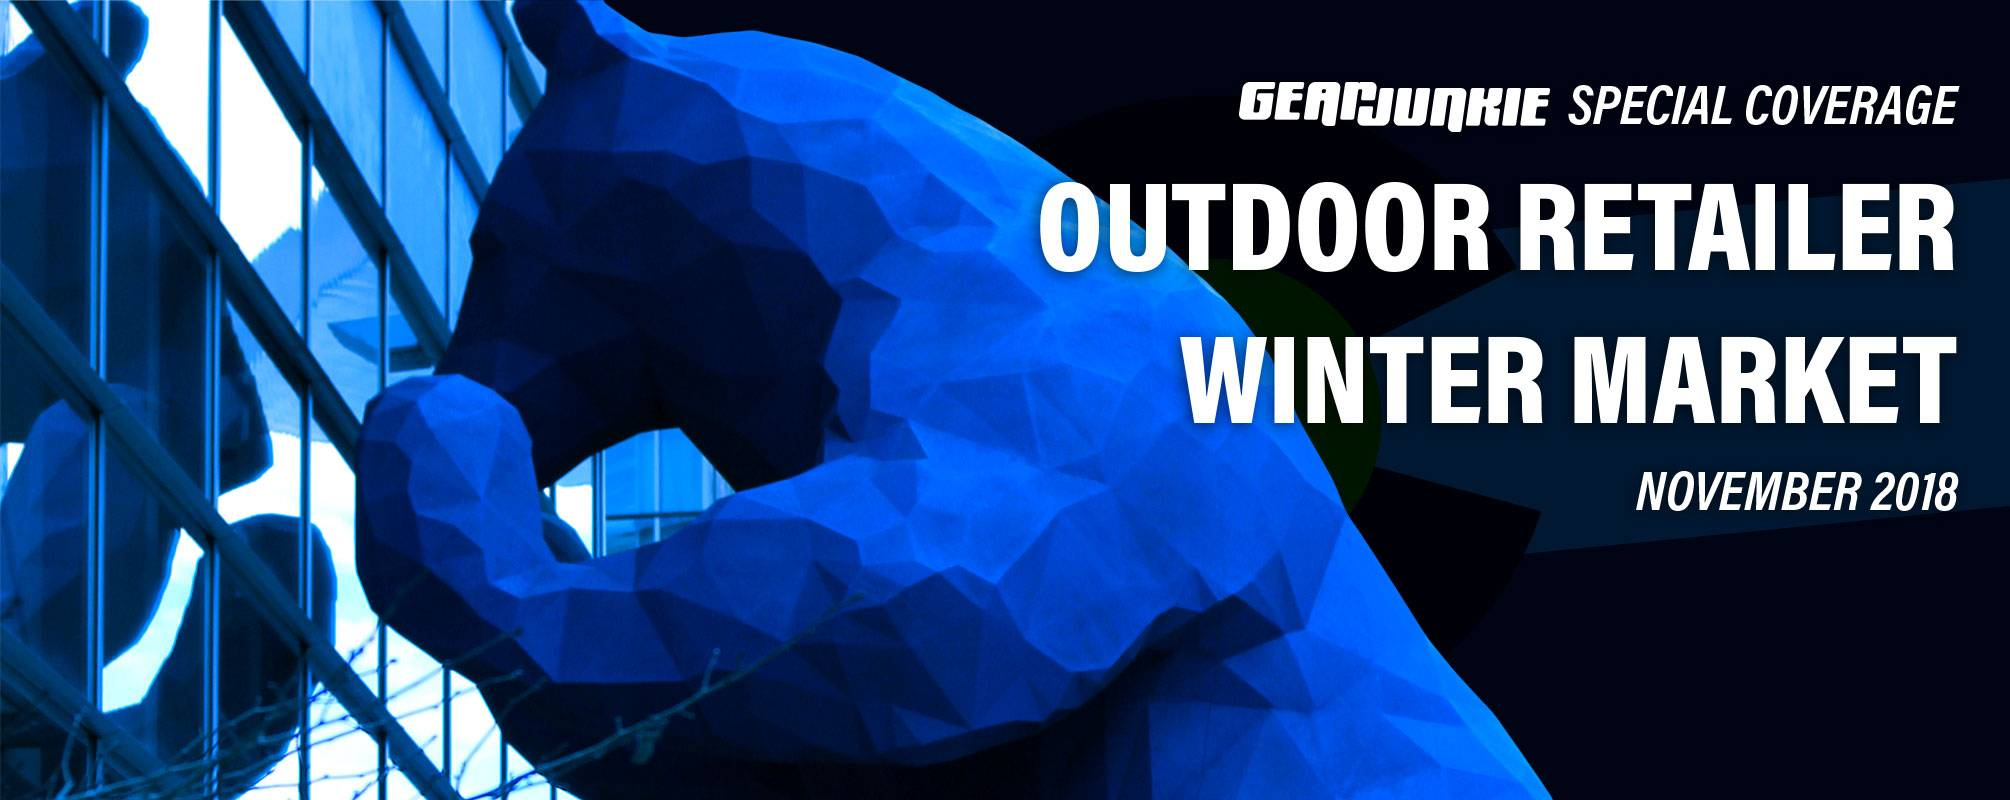 Get the latest from GearJunkie on Outdoor Retailer 2018 Winter Market